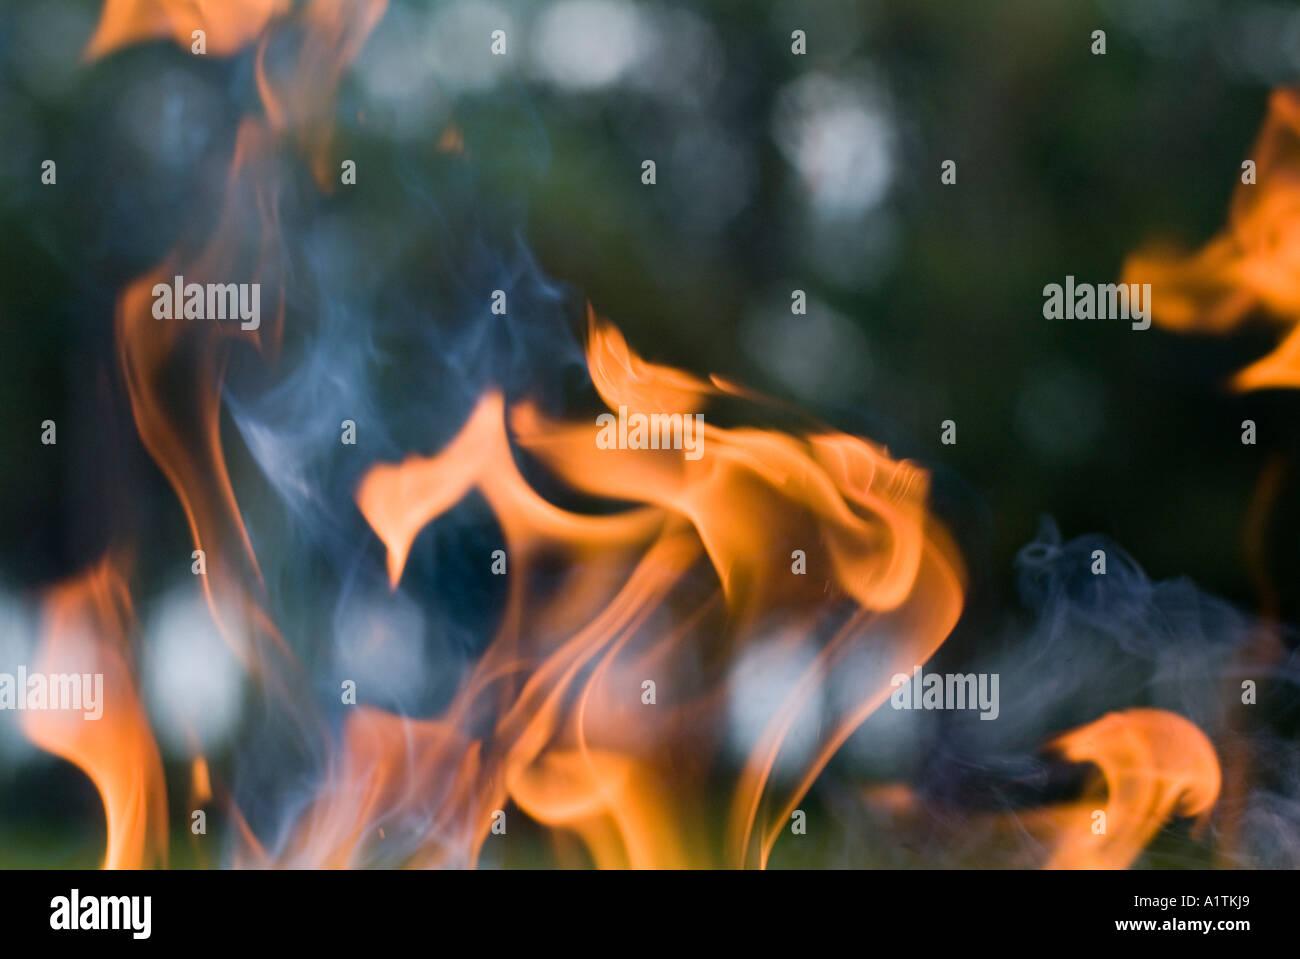 Incendio en un bosque de Francia Aquitania Landas Mano Imagen De Stock